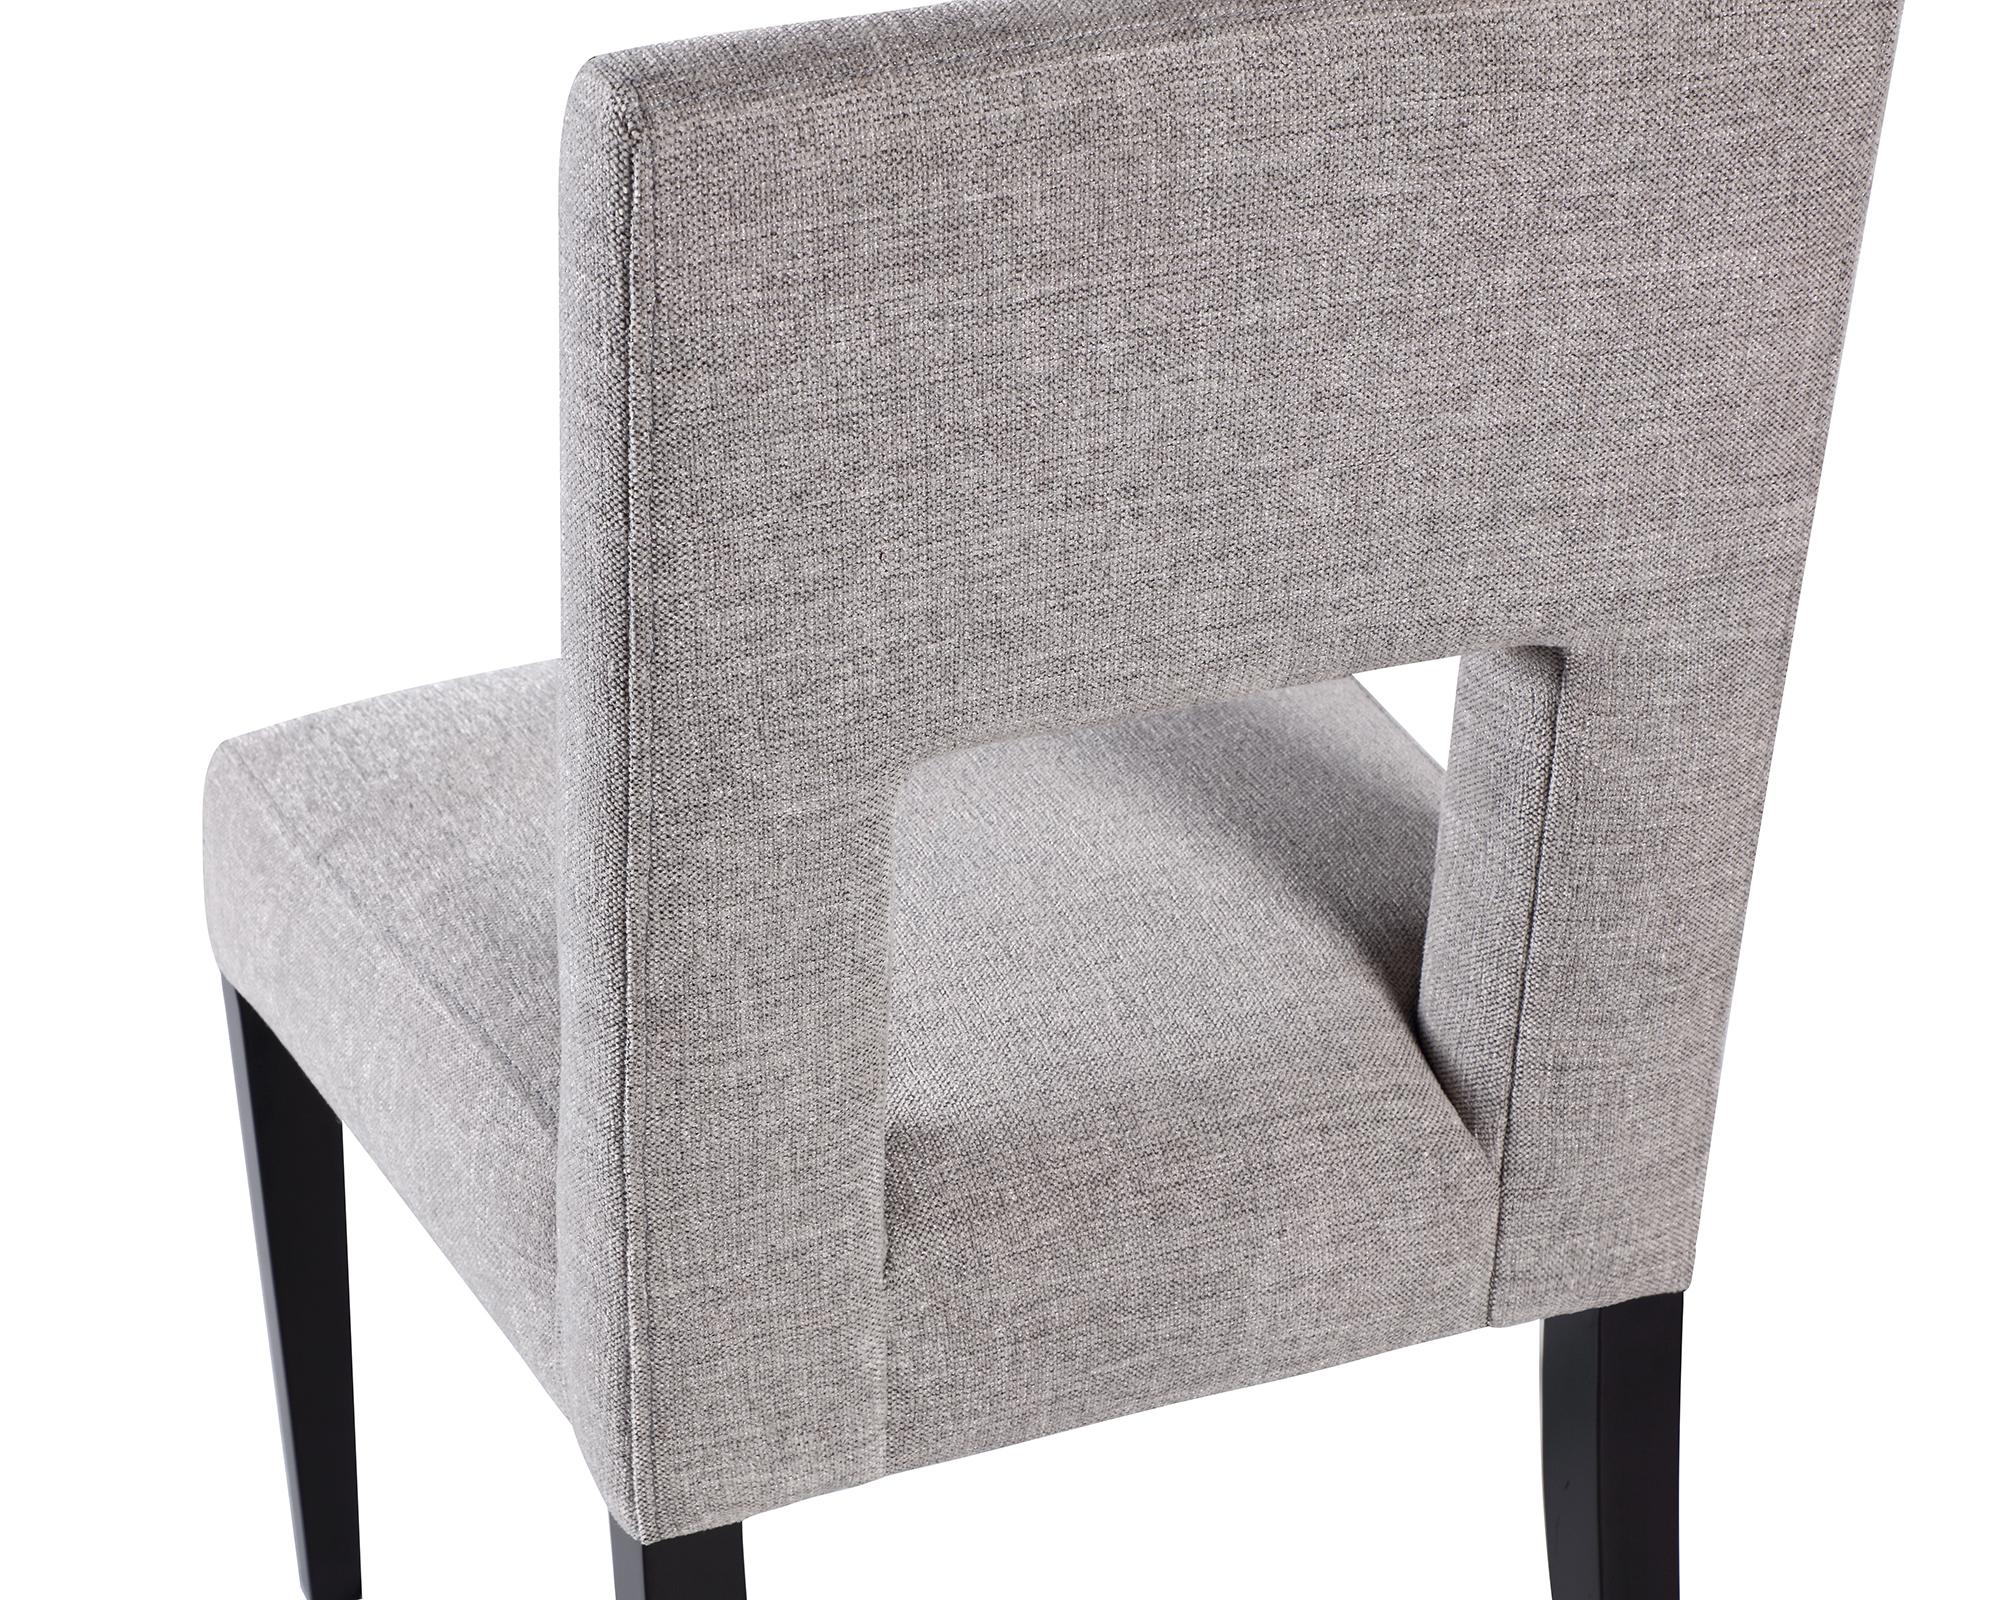 L&E Venice Dining Chair – Ash Grey Chenille (MY-DCH-016) (1)